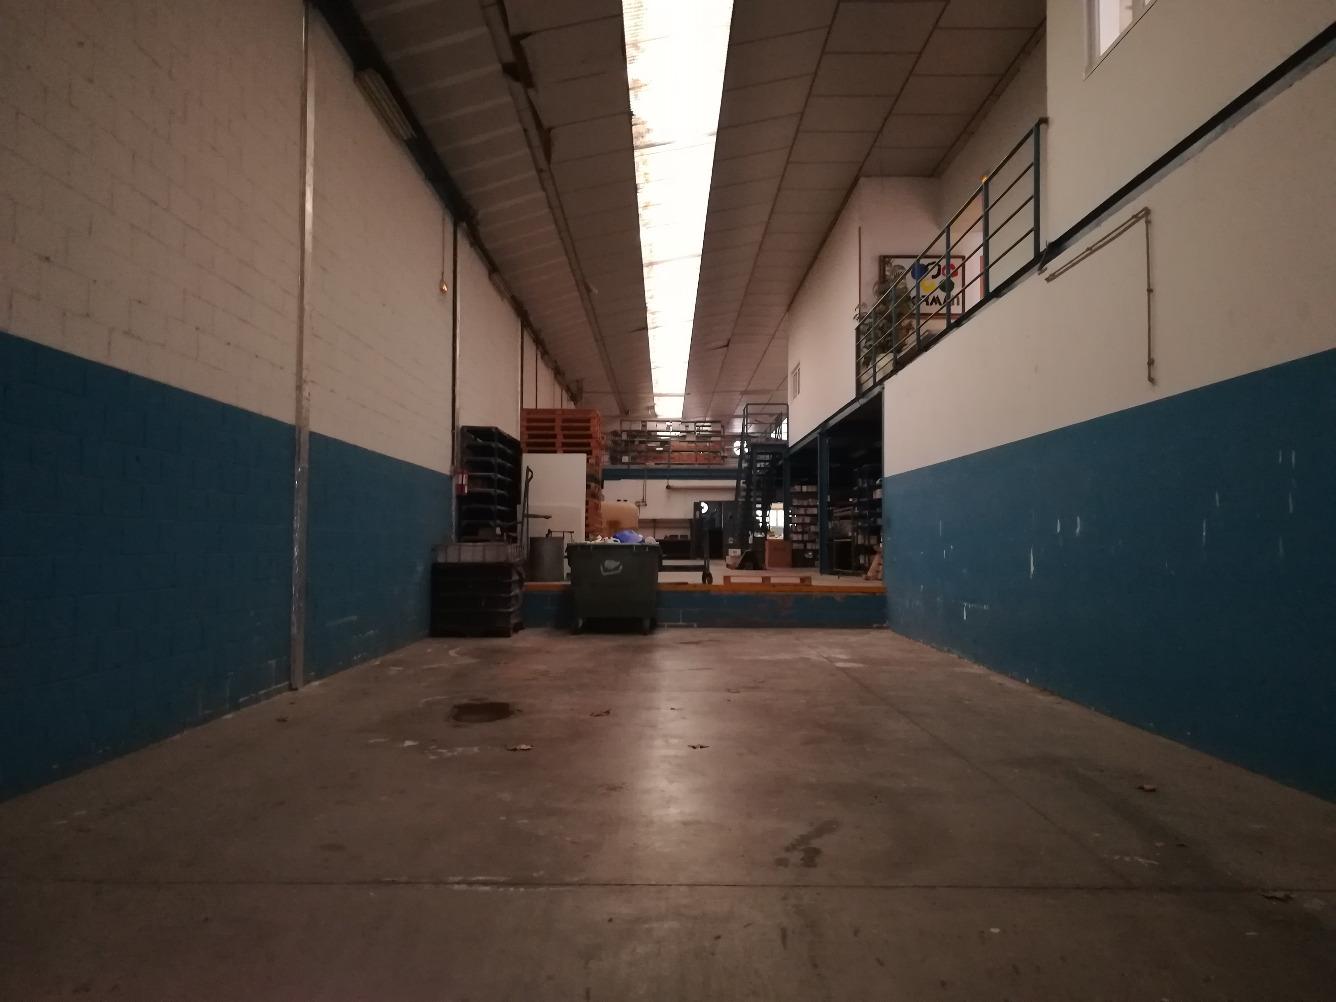 Lloguer Nau industrial  Poligono industrial ctra. pont de vilomara